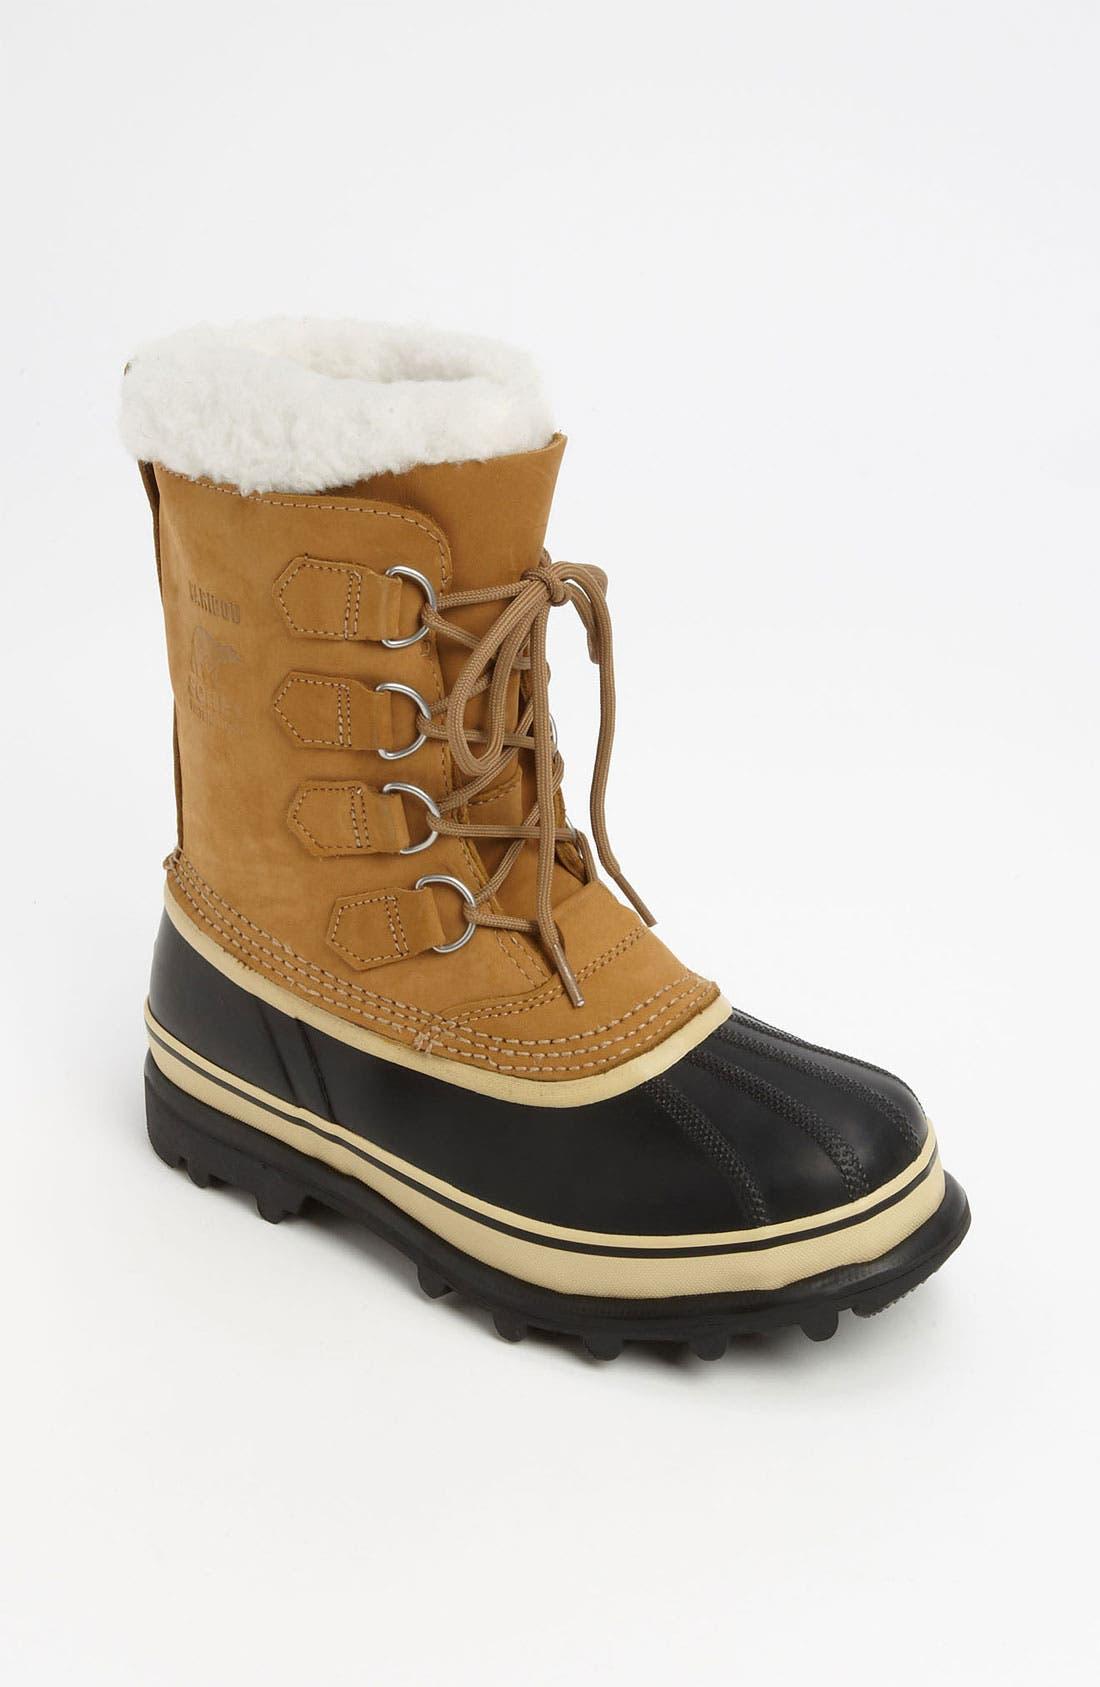 Alternate Image 1 Selected - SOREL 'Caribou' Boot (Women)